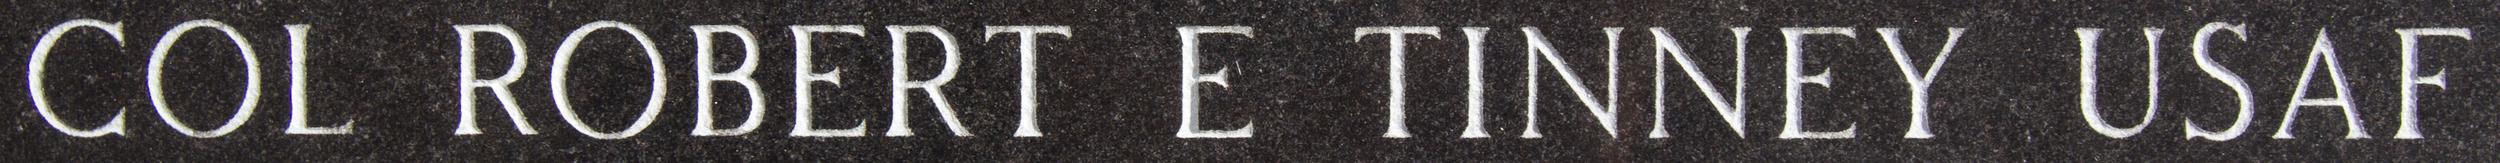 Example of Individual Granite Etching